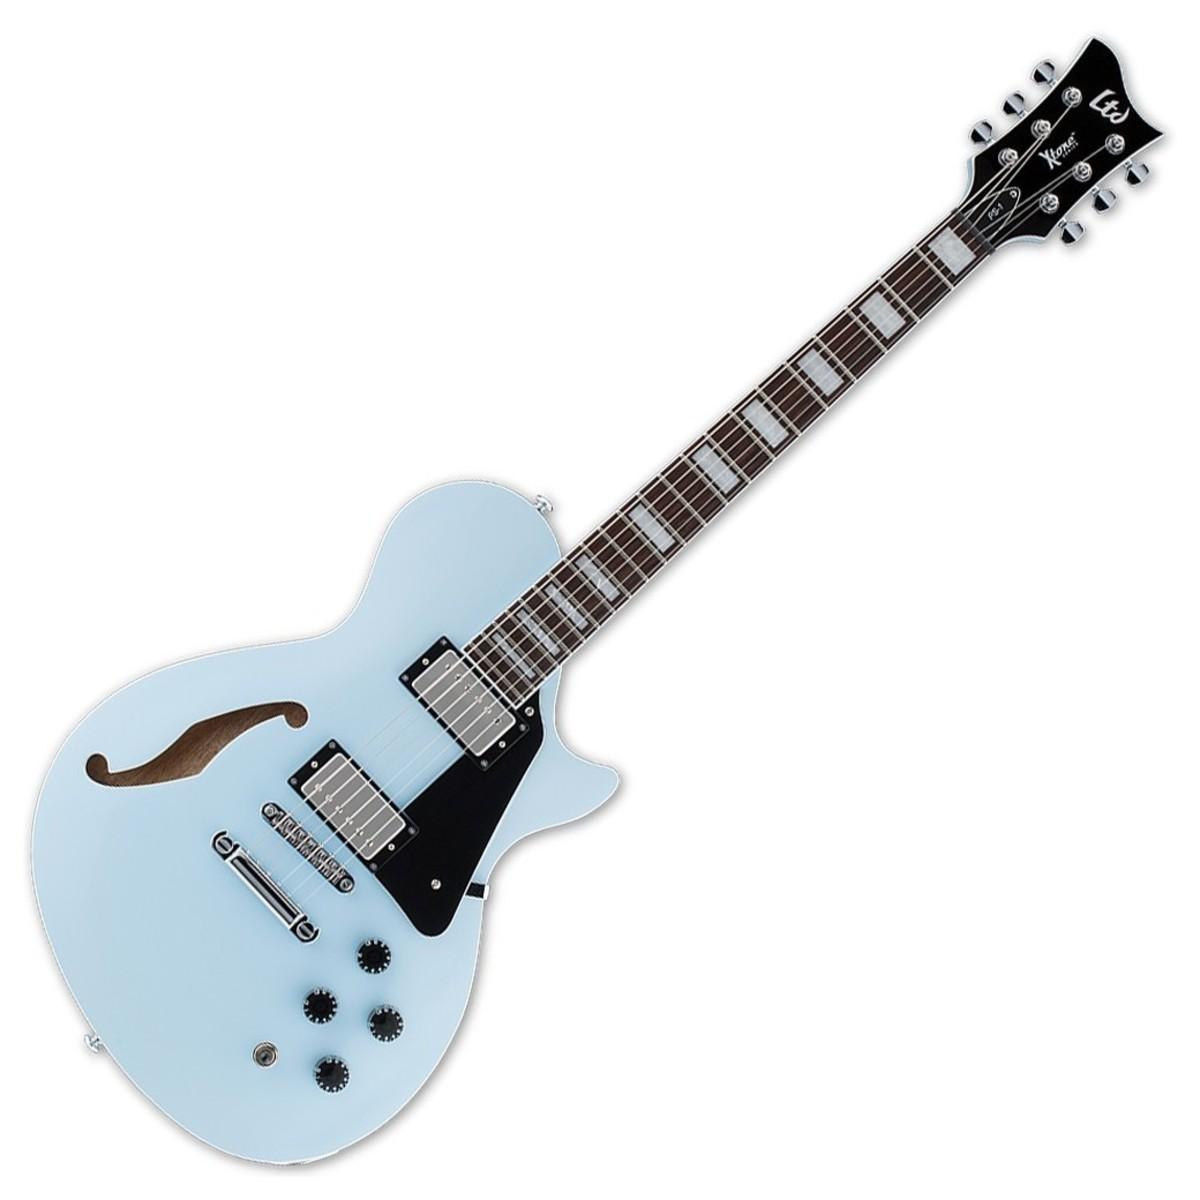 esp ltd ps 1 xtone series semi hollow electric guitar sonic blue at gear4music. Black Bedroom Furniture Sets. Home Design Ideas